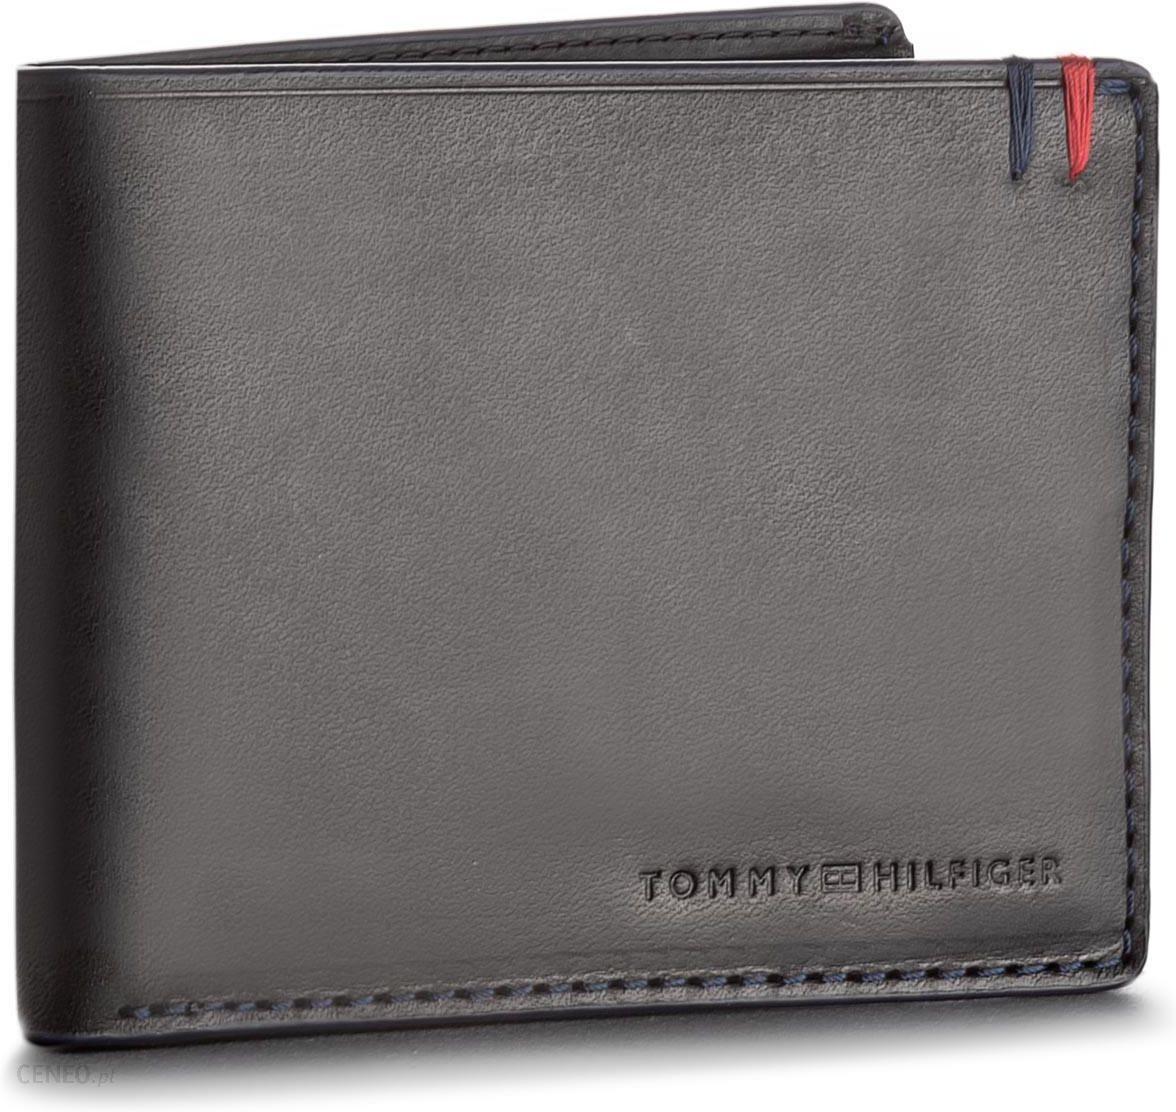 691136e4c2a86 Duży Portfel Męski TOMMY HILFIGER - Burnished Mini Cc Wallet AM0AM03059 002  - zdjęcie 1